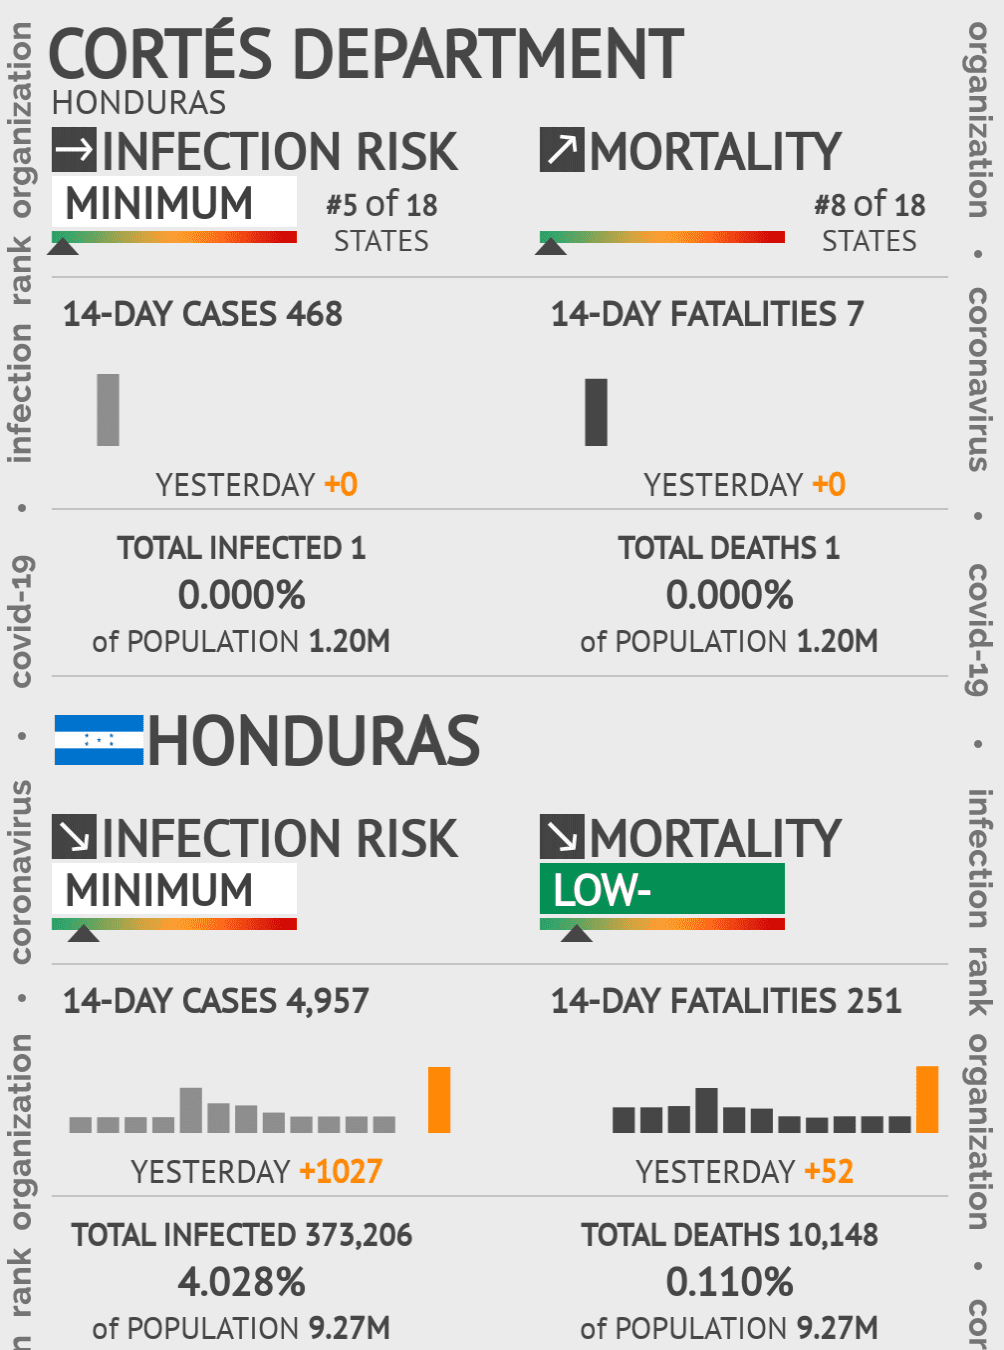 Cortés Coronavirus Covid-19 Risk of Infection on December 03, 2020